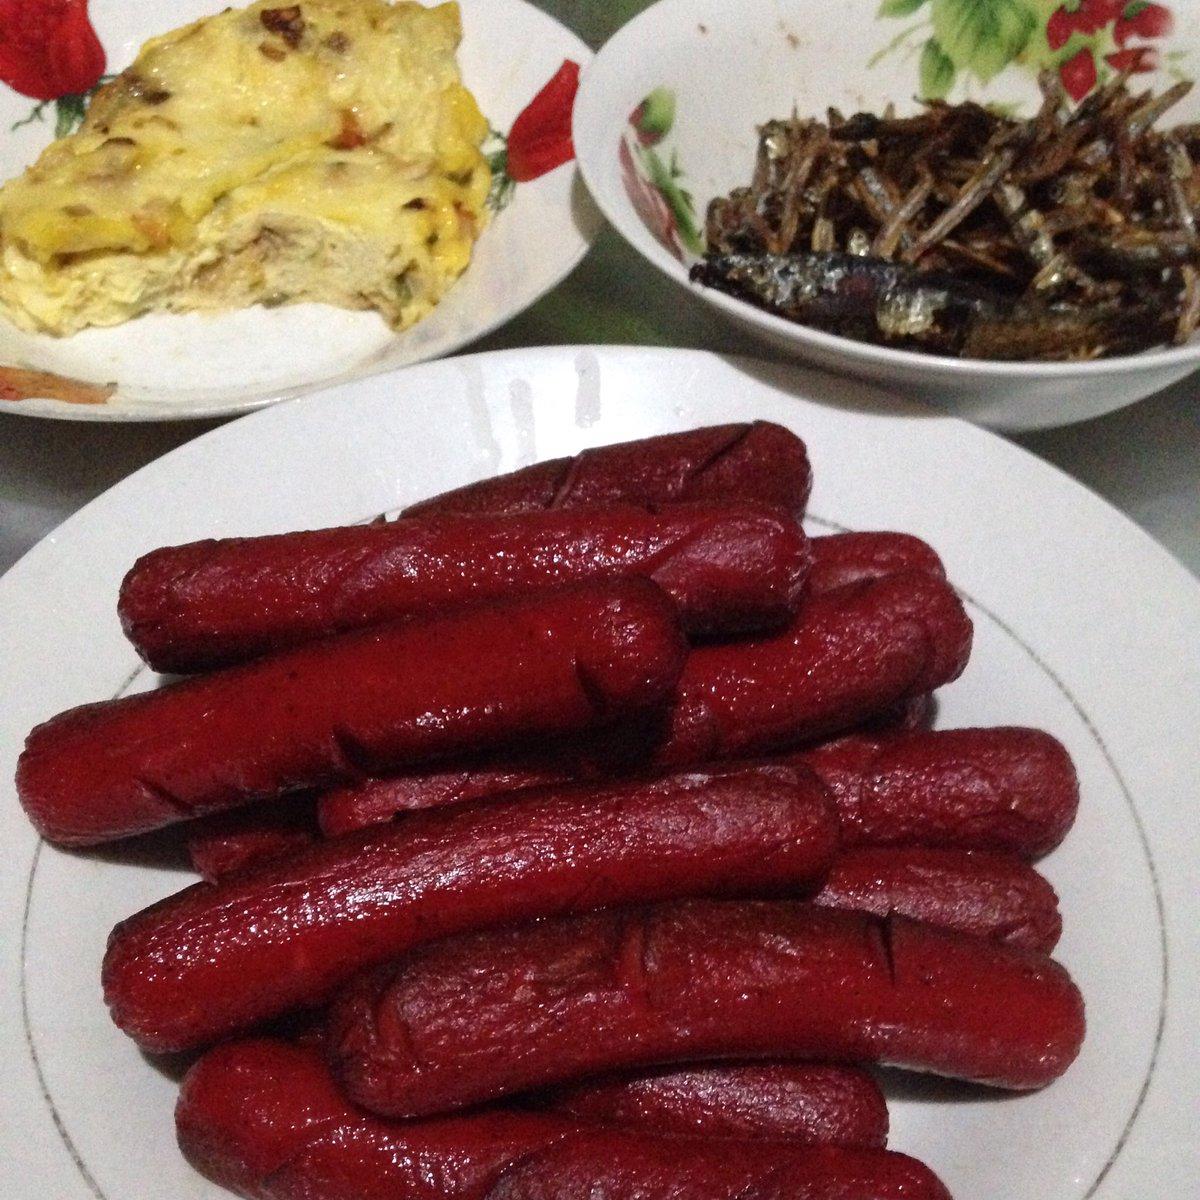 Dinner Breakfast! Attack! #foodie #foodpic #follow #followers #followme #followmeplease #pleasefollowme #followmefollowyou #followmefollowback #follow4follow #followforfollow #retweet #likelikelike<br>http://pic.twitter.com/L6zZHaTgLh